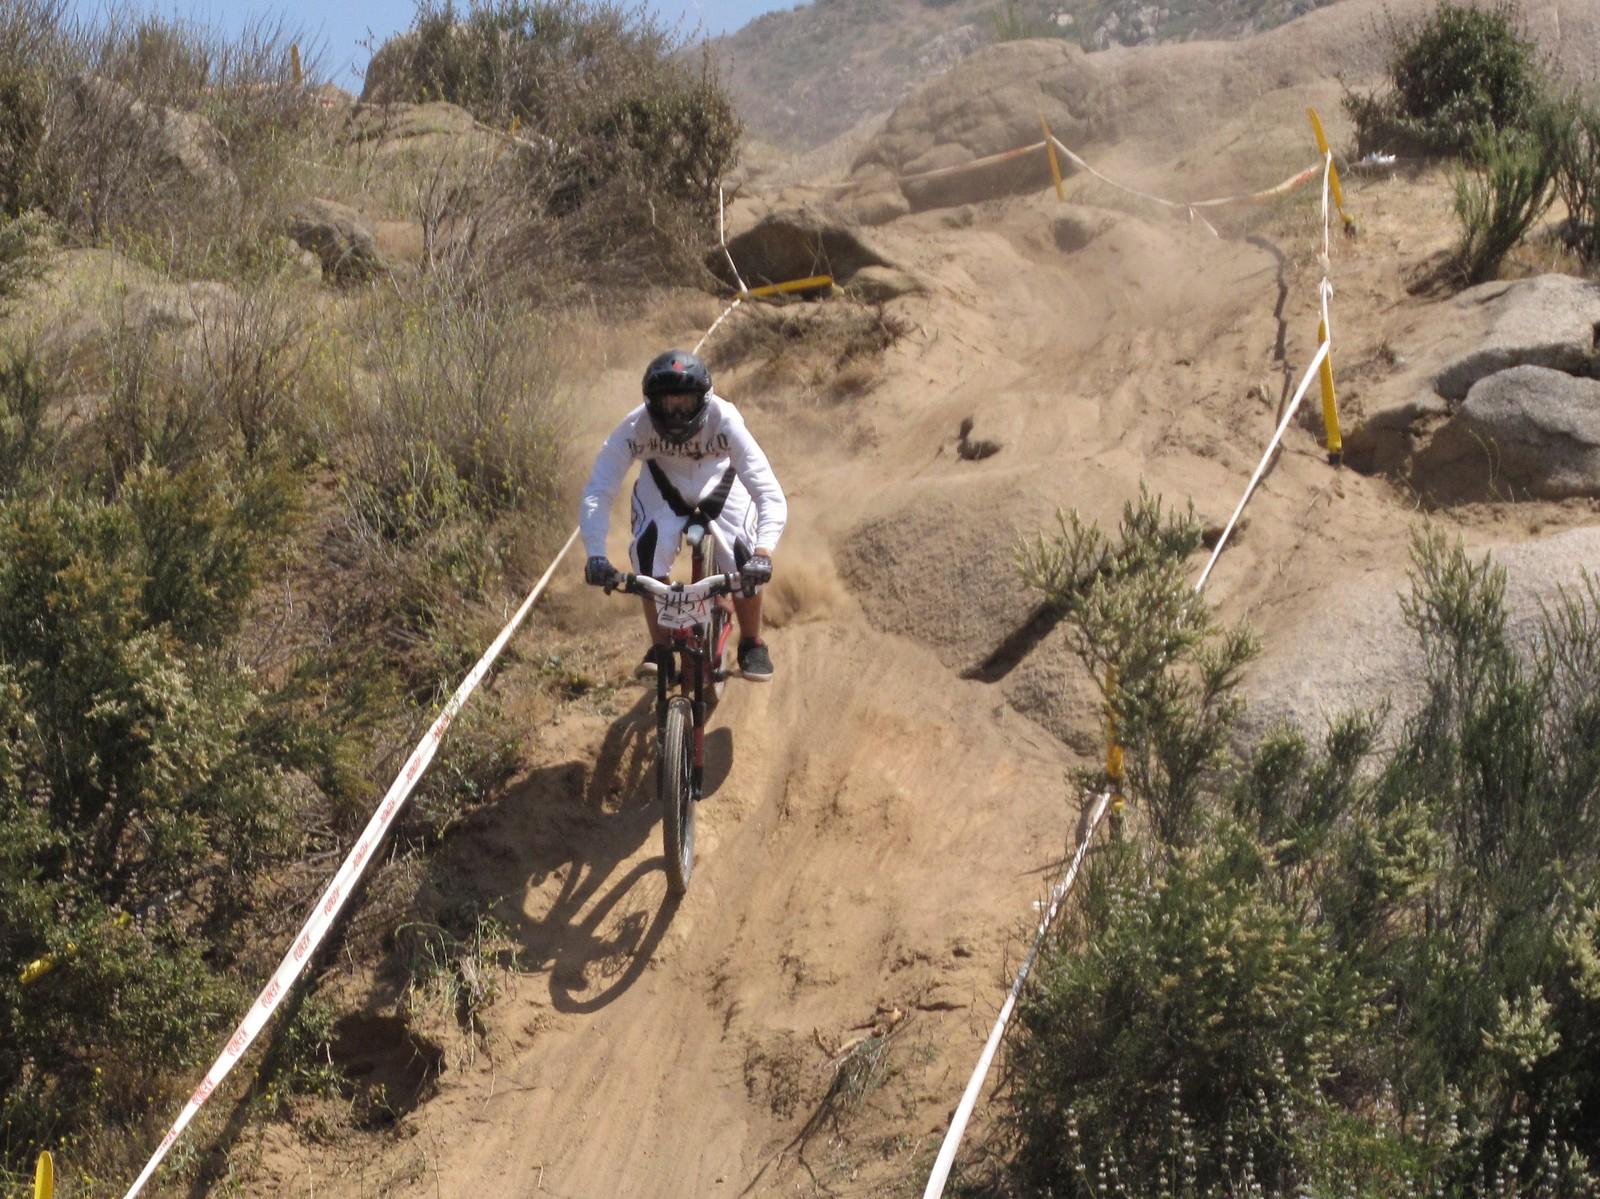 henry fontana bike race 5-2010 113 - Henry_Young - Mountain Biking Pictures - Vital MTB